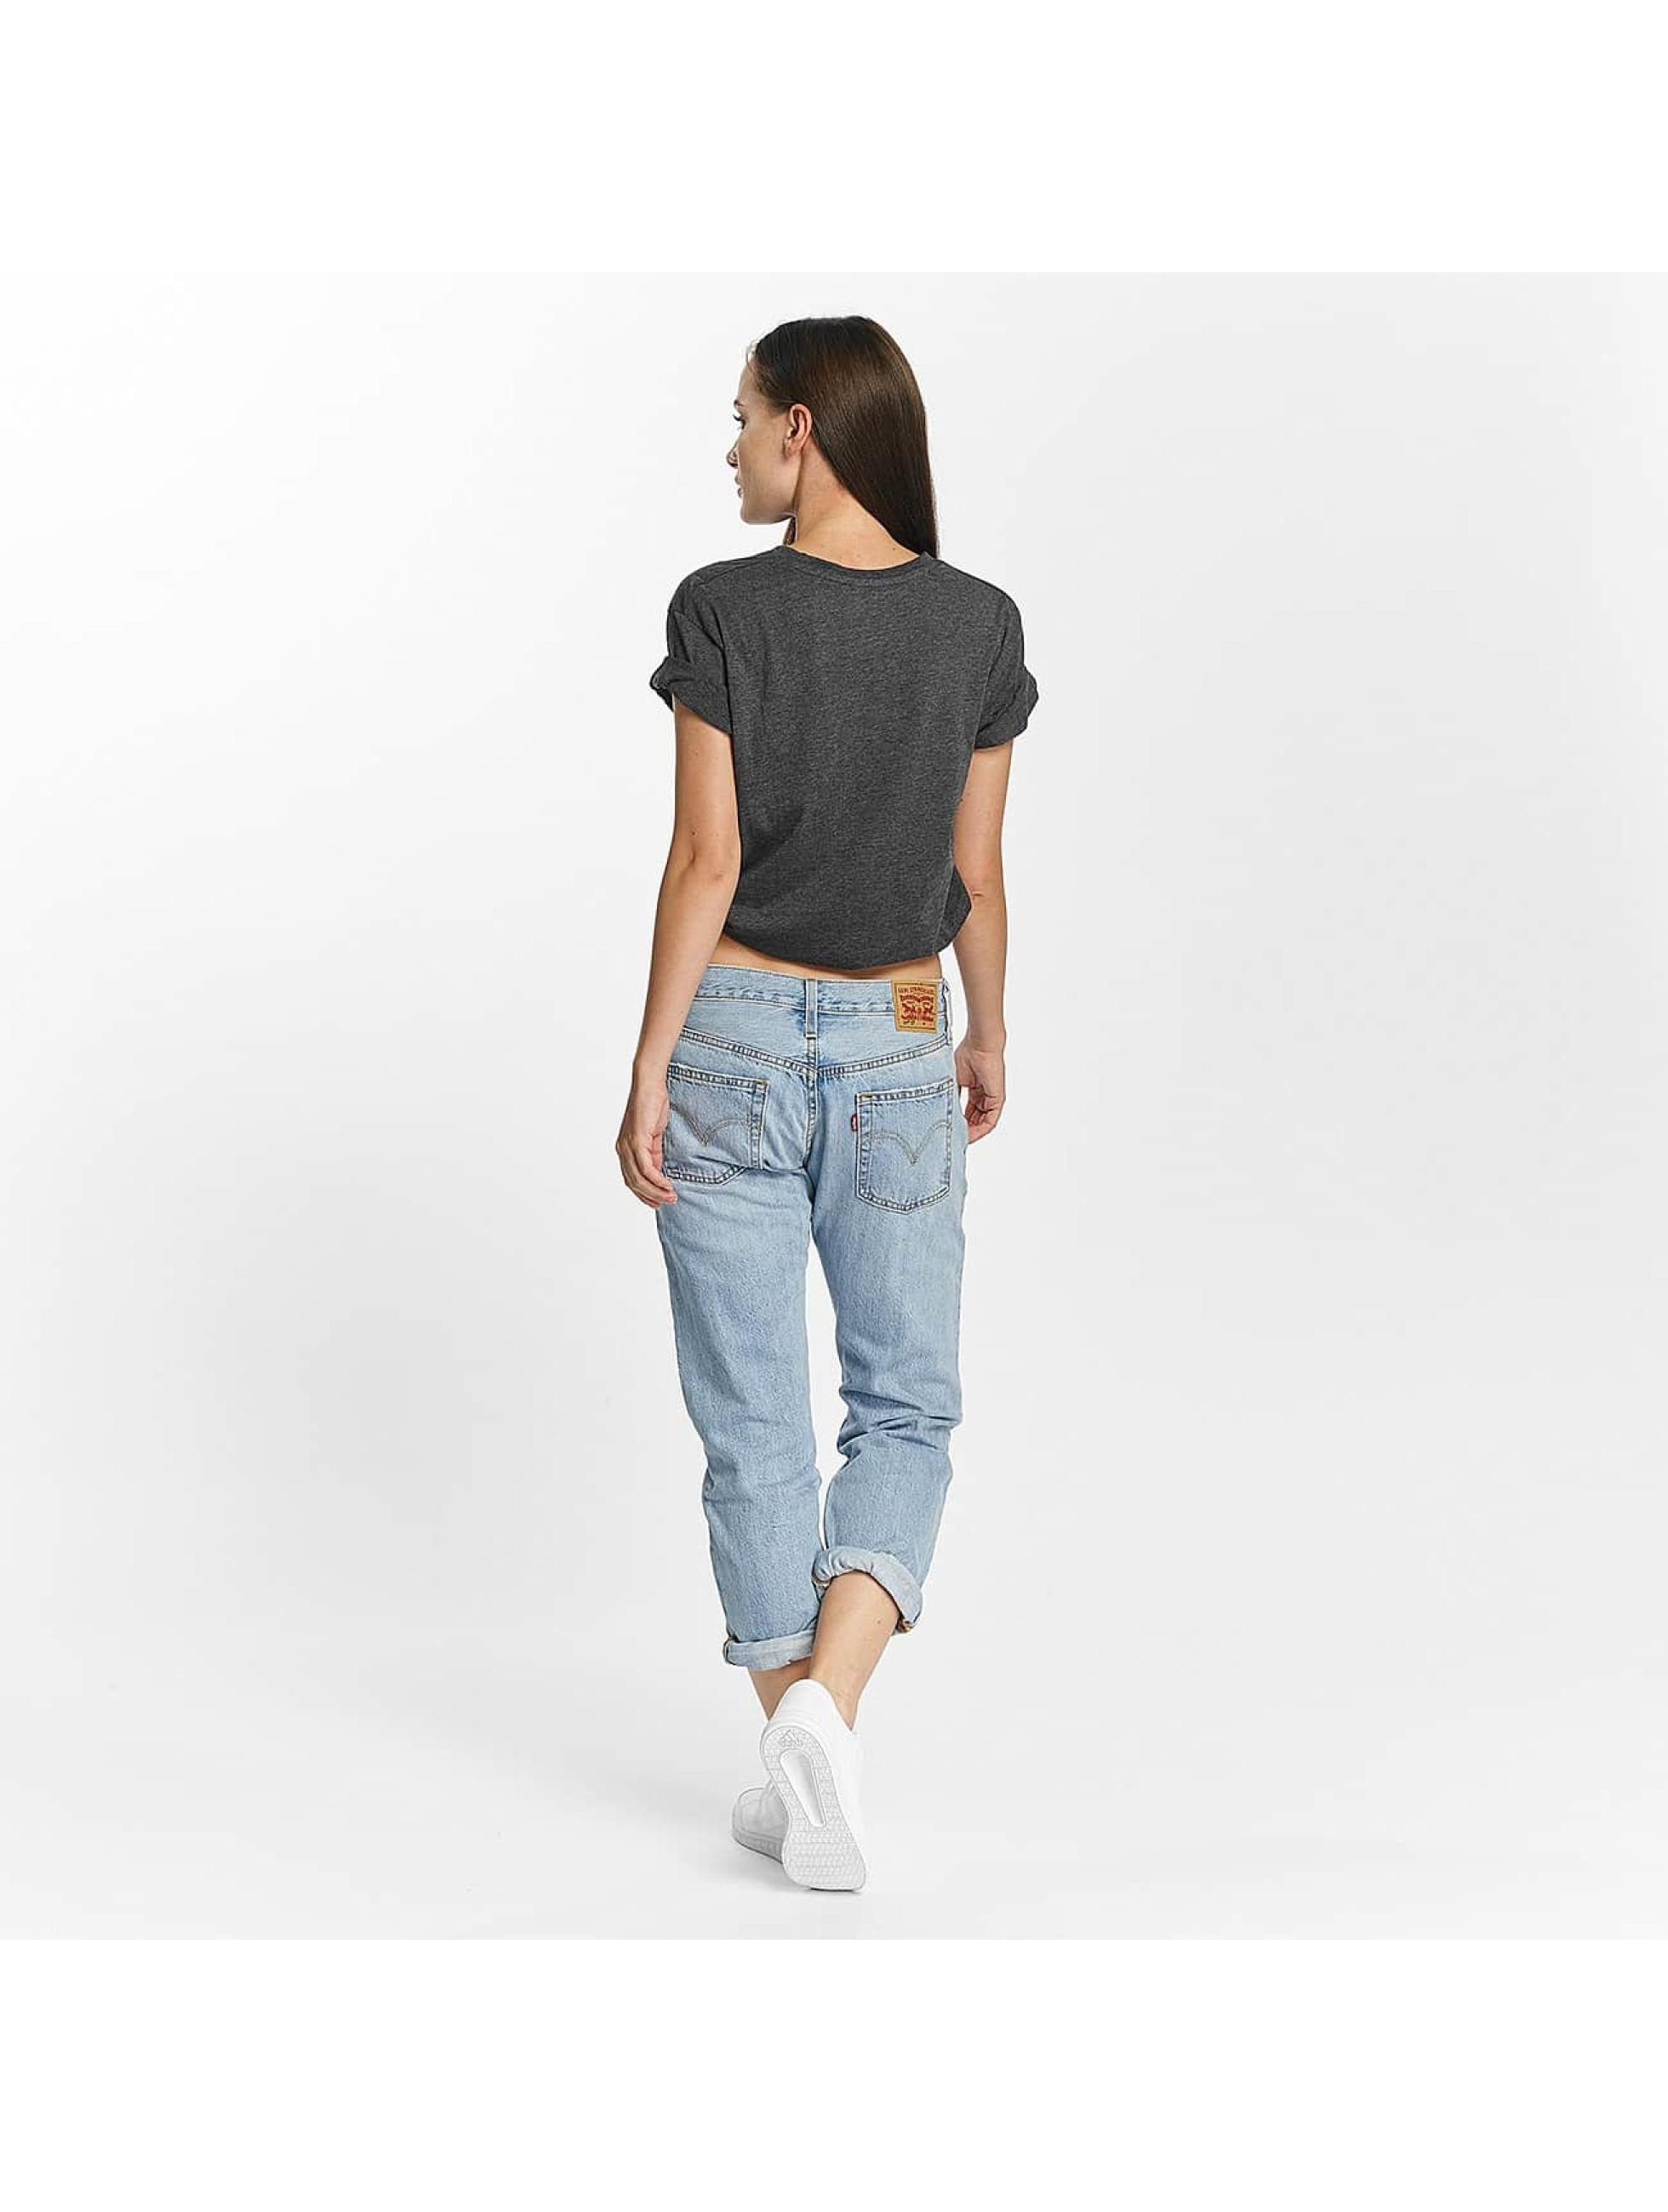 Cyprime t-shirt Basic Organic Cotton Oversized grijs